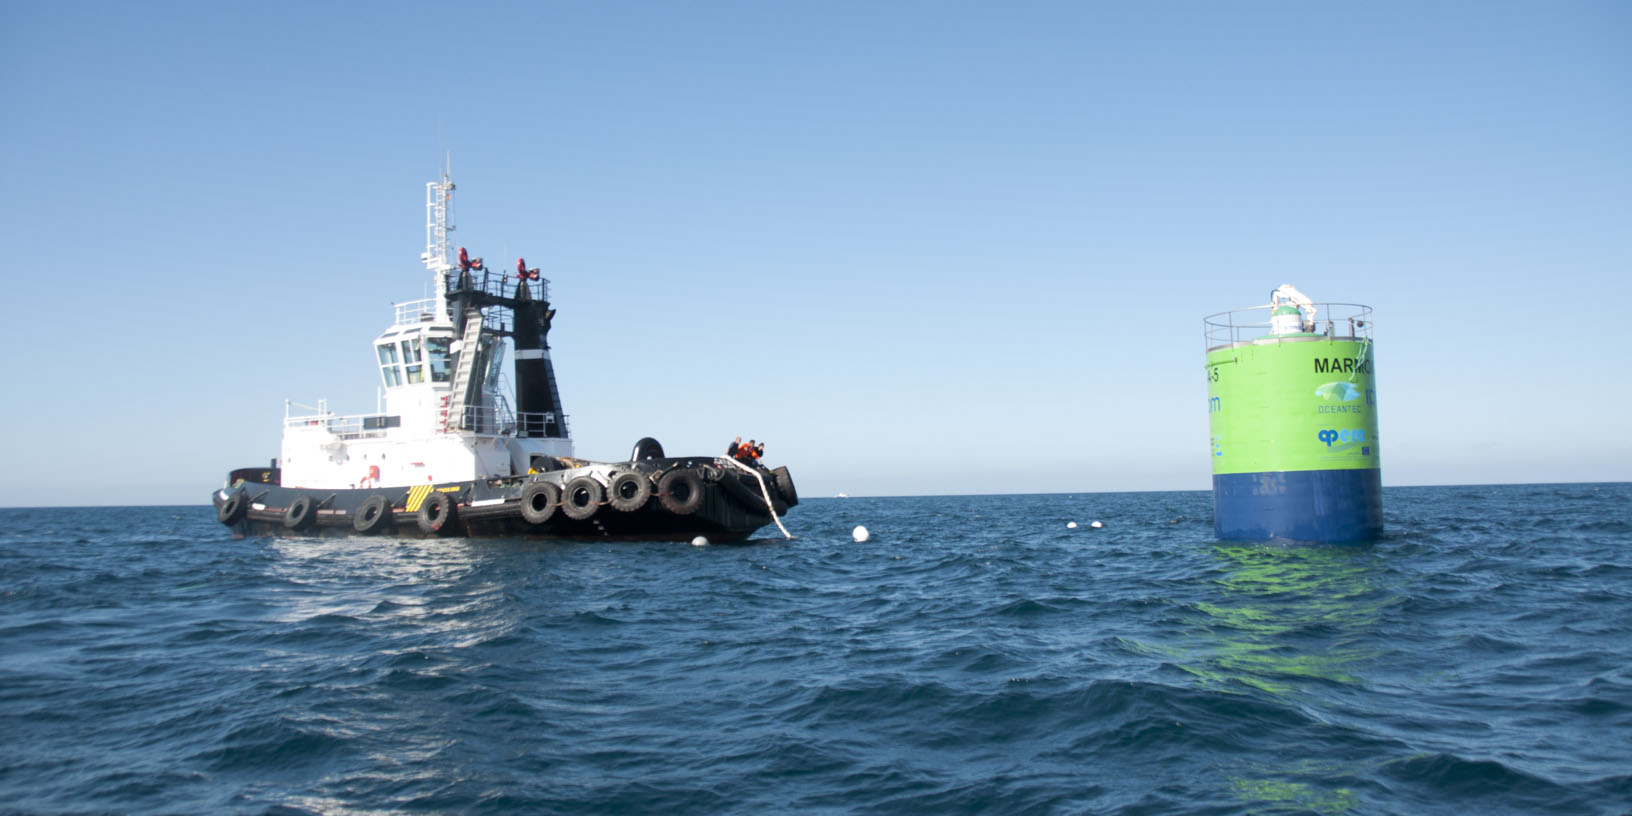 Marine_Energy_WEC_Wave_energy-Marmok-A5_Open_Sea_Testing_OPERA_2020_IDOM (b)